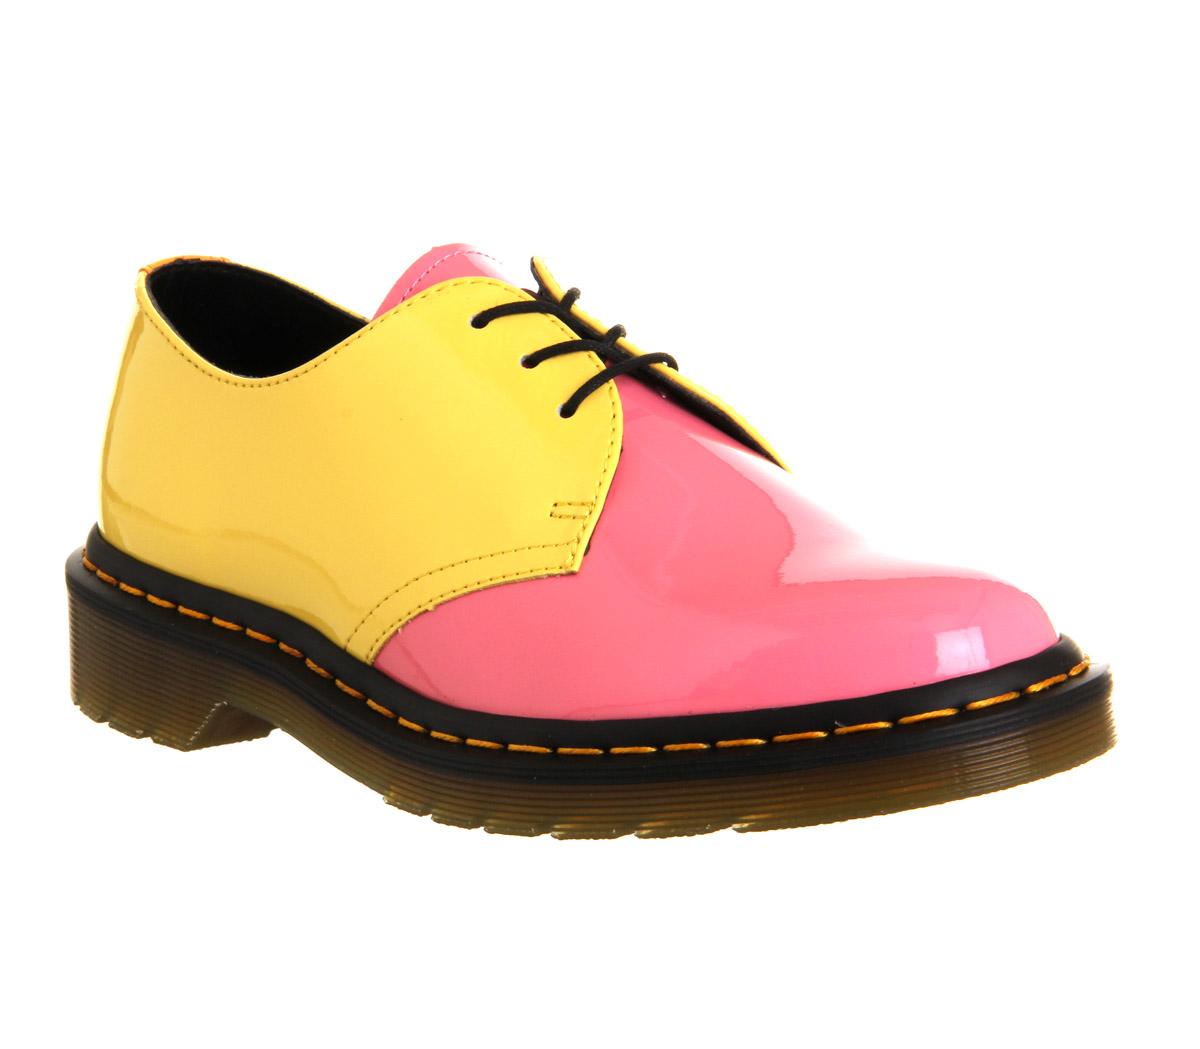 Womens Dr Martens  Shoe Flats